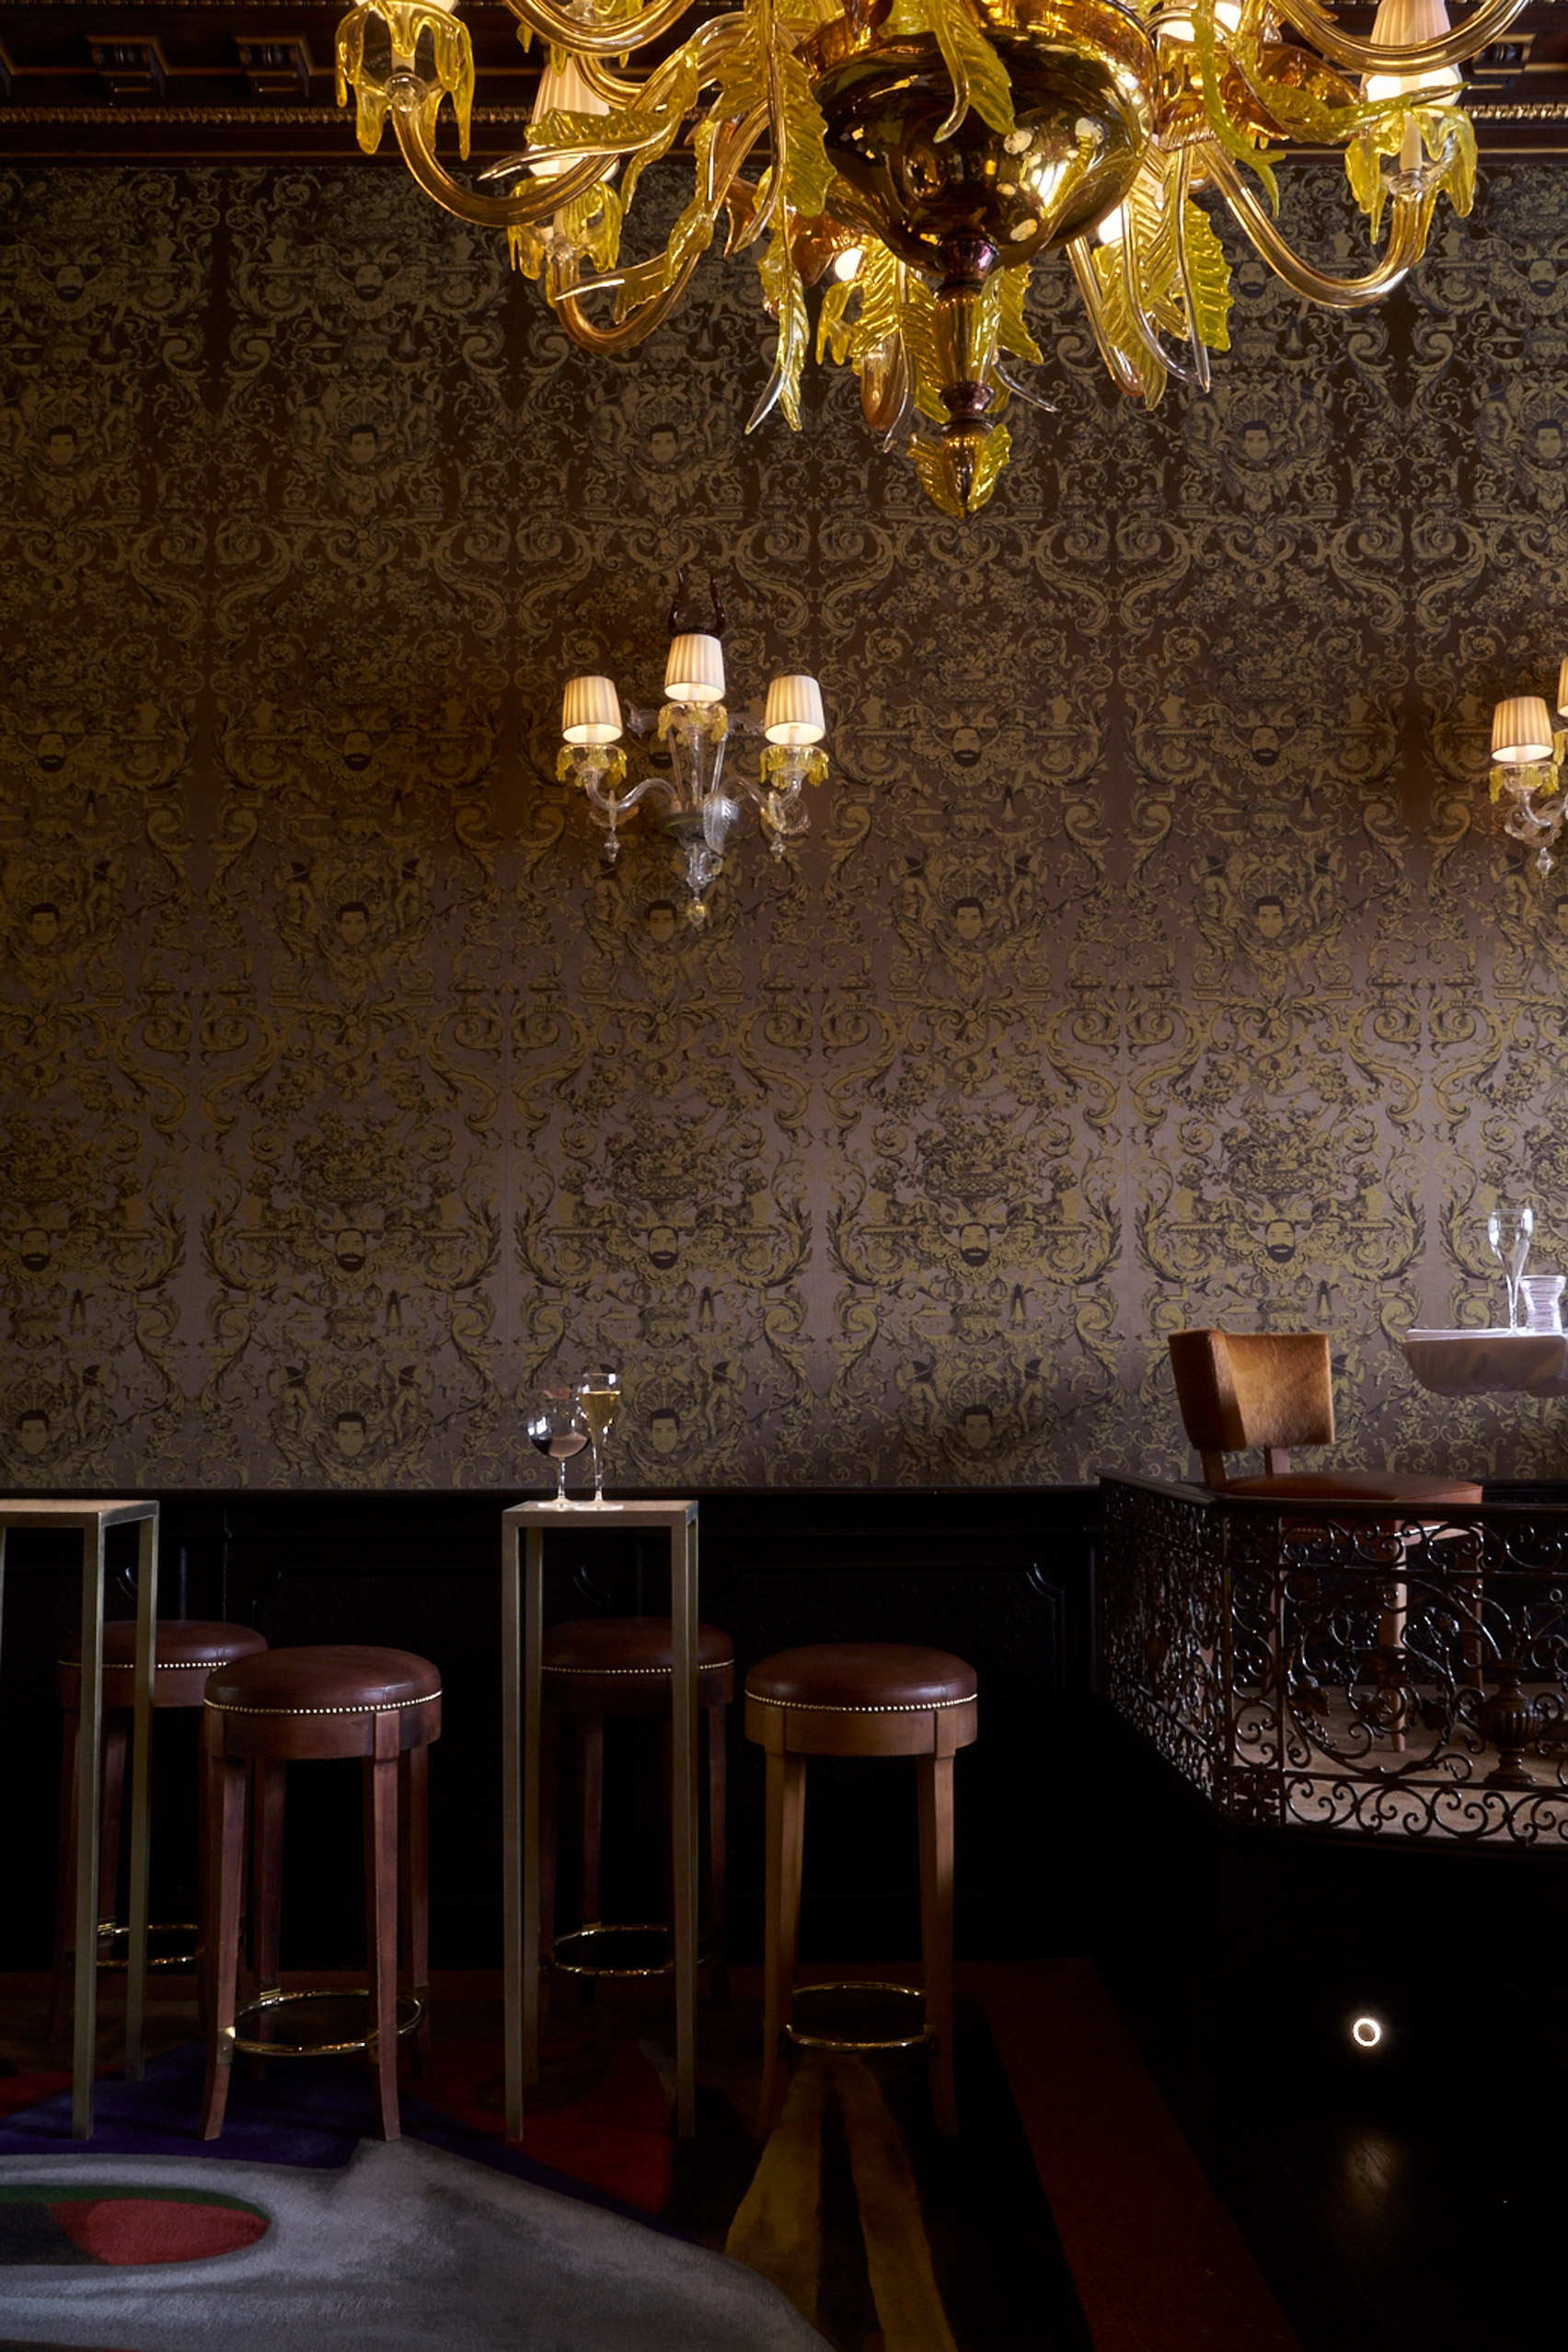 quadri-philippe-starck-interiors-restaurants-bars-venice-italy_dezeen_1704_col_14.jpg